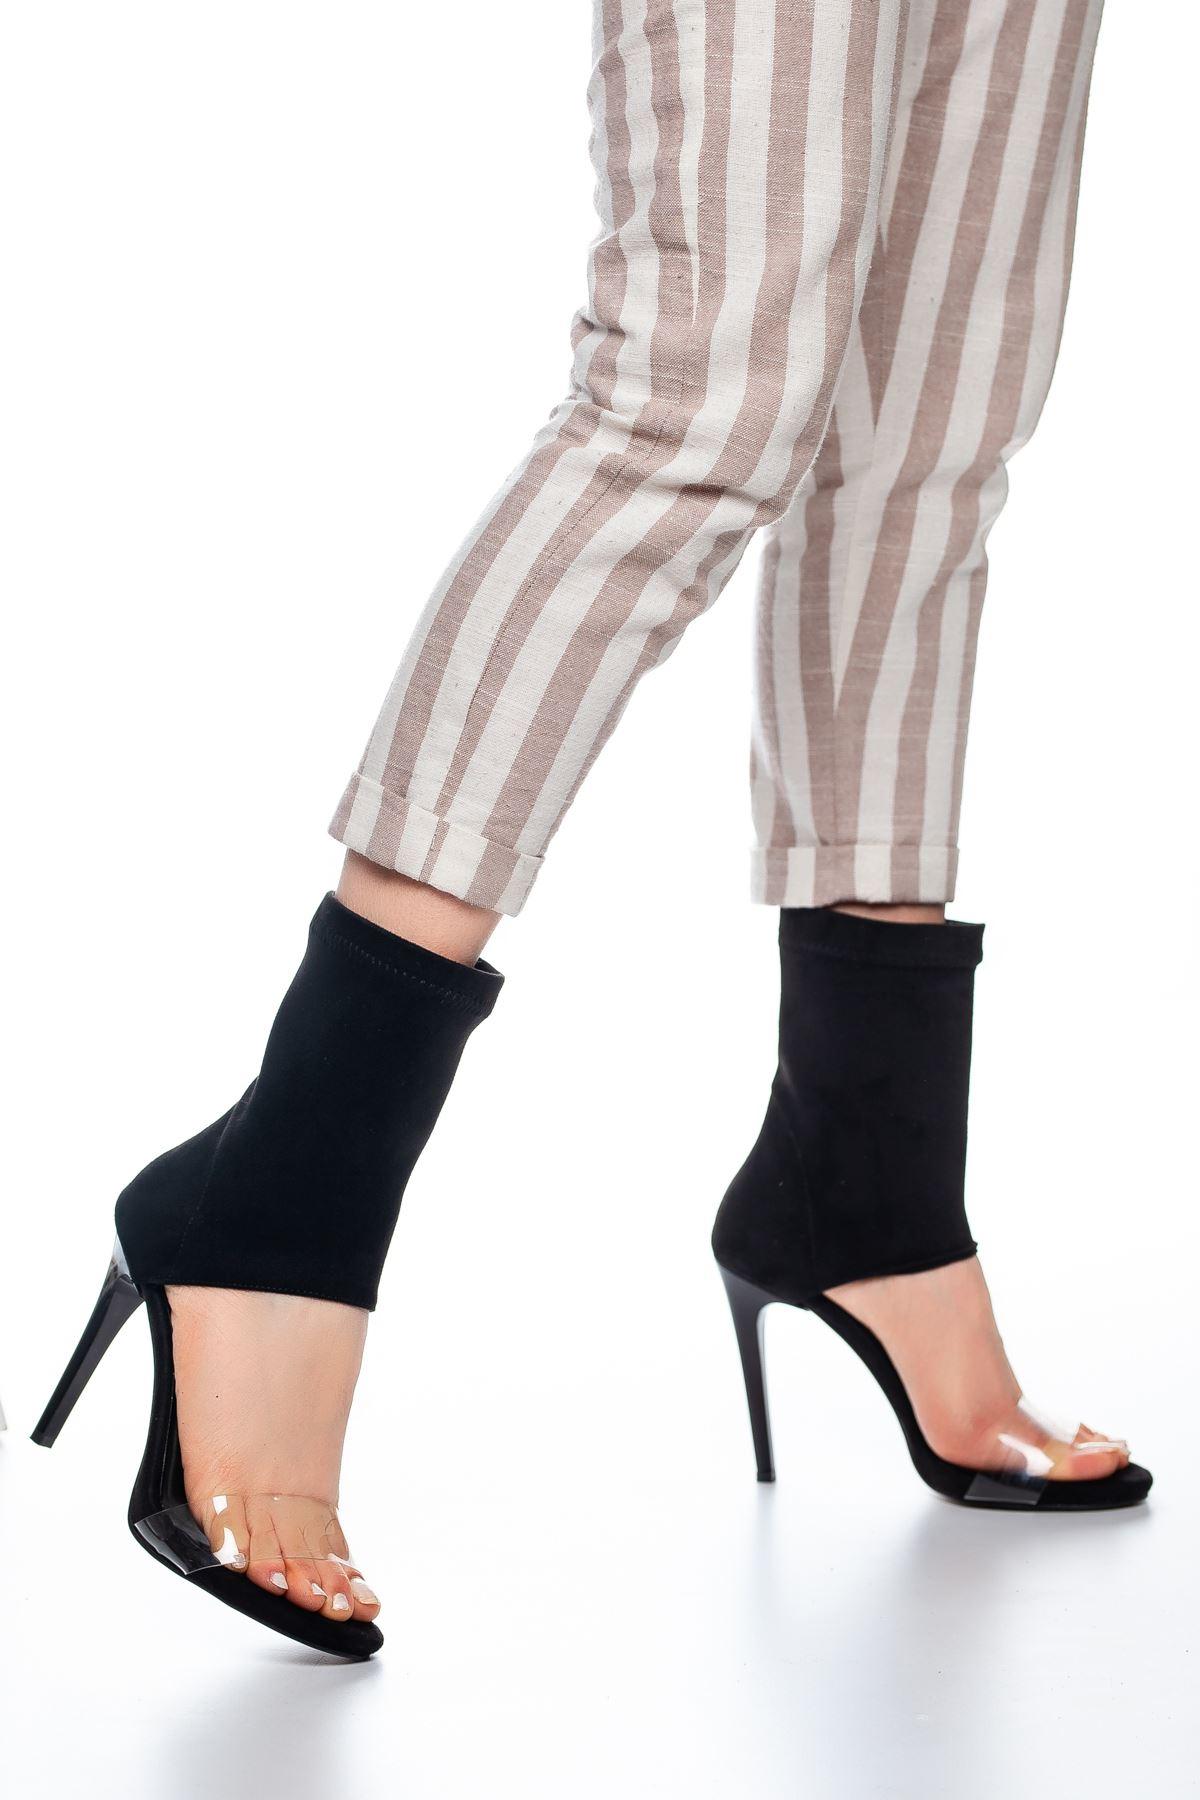 Ony Bant Detaylı Süet Topuklu Ayakkabı Siyah